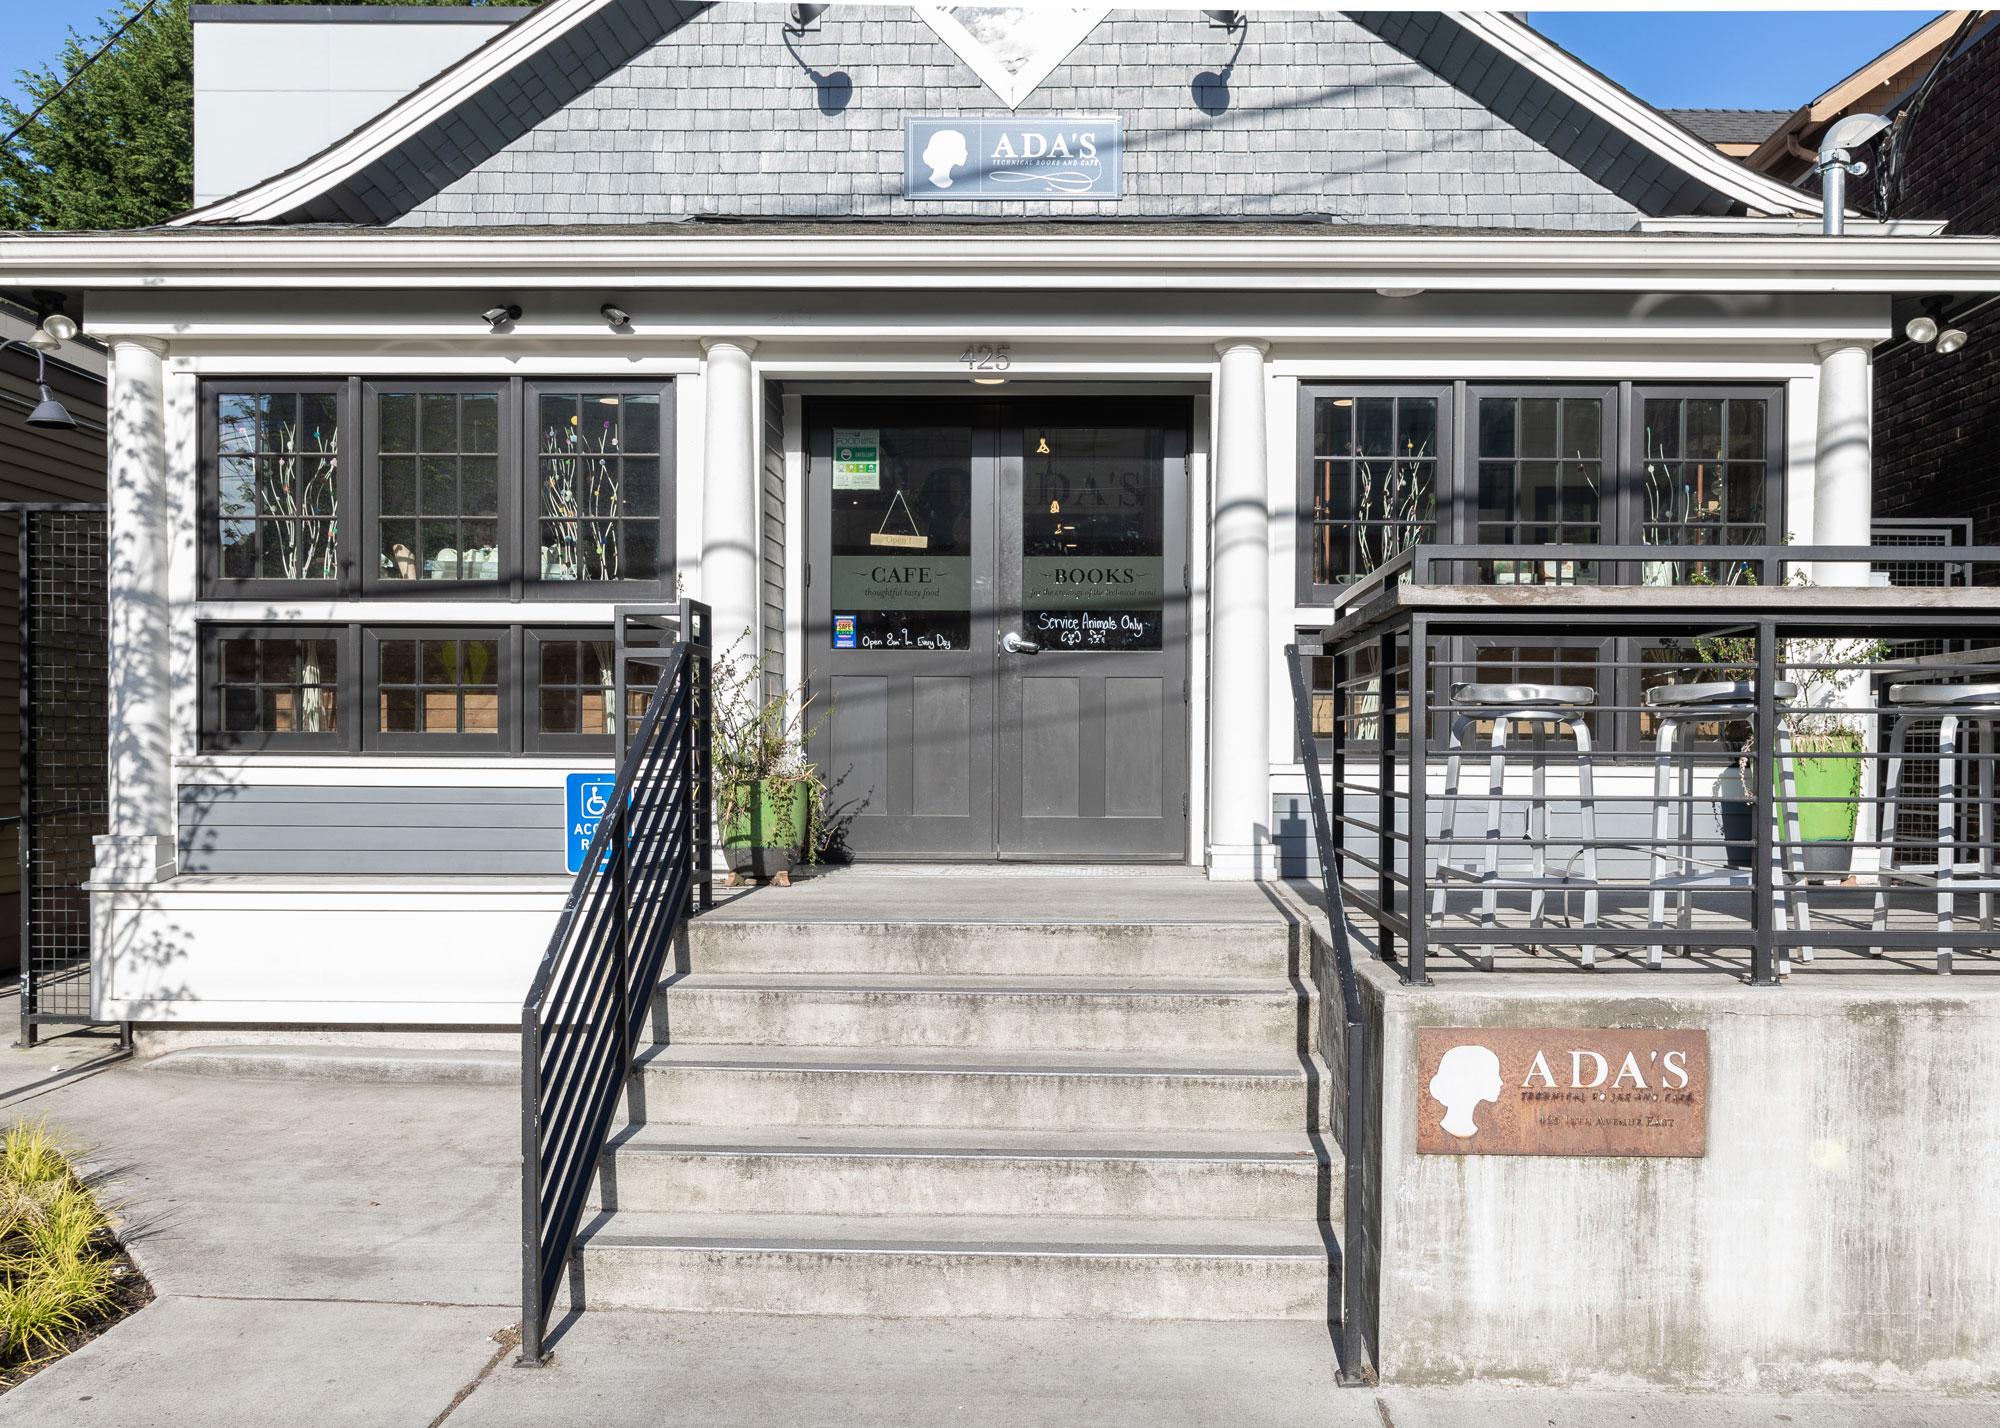 Ada's Books & Cafe